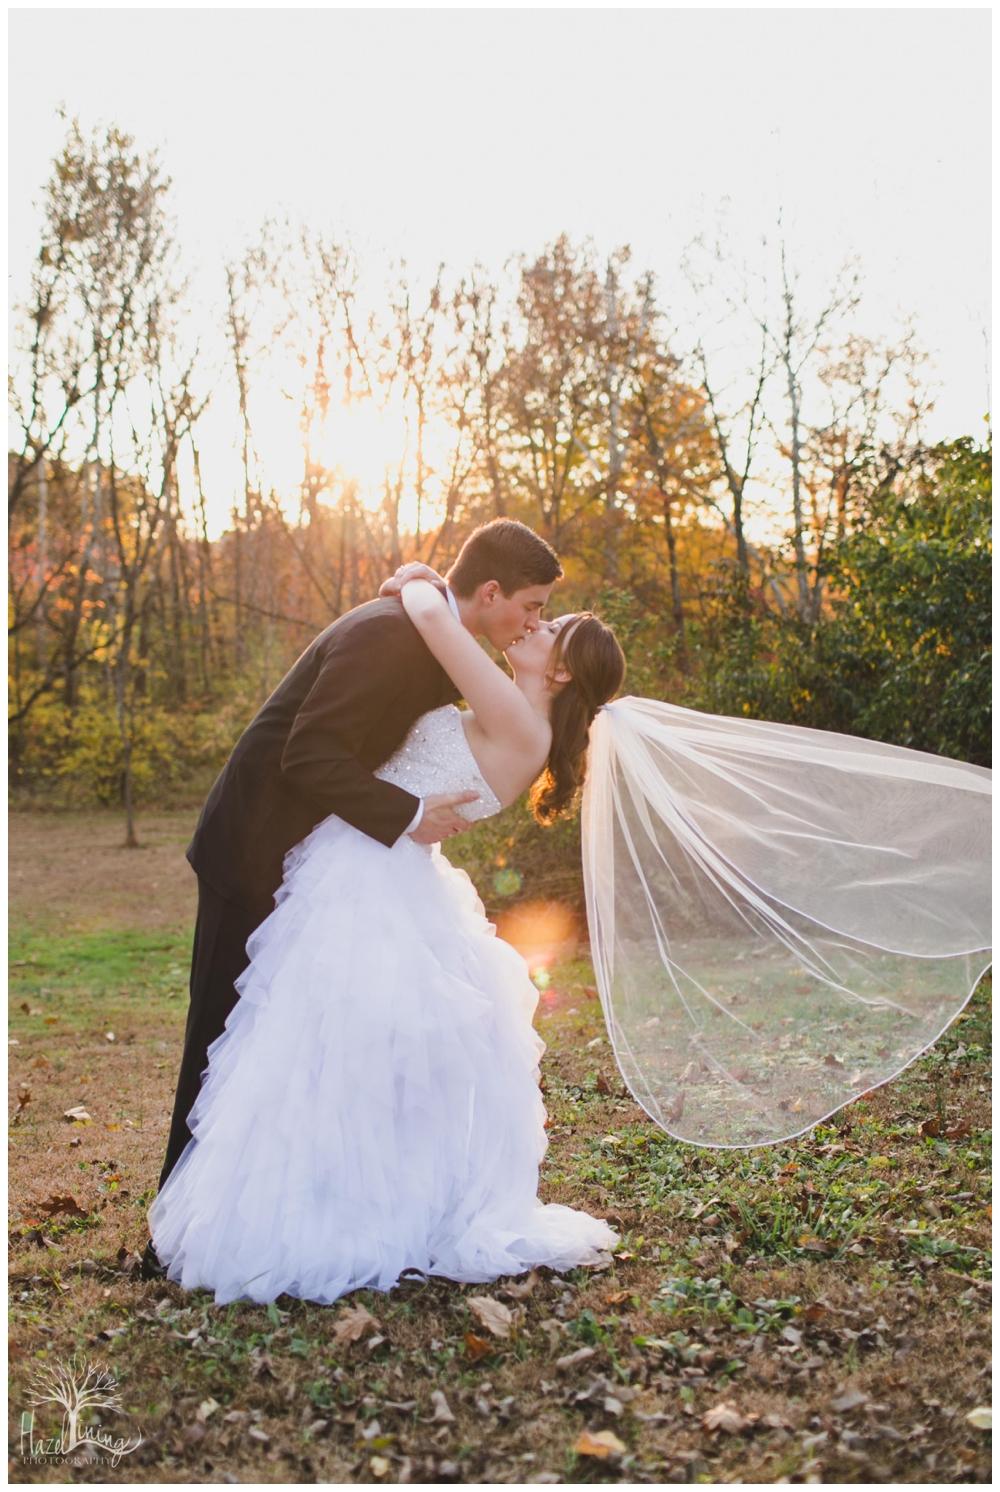 hazel-lining-photography-wedding-portrait-buckscounty-pennsylvania-stephanie-reif_0343.jpg